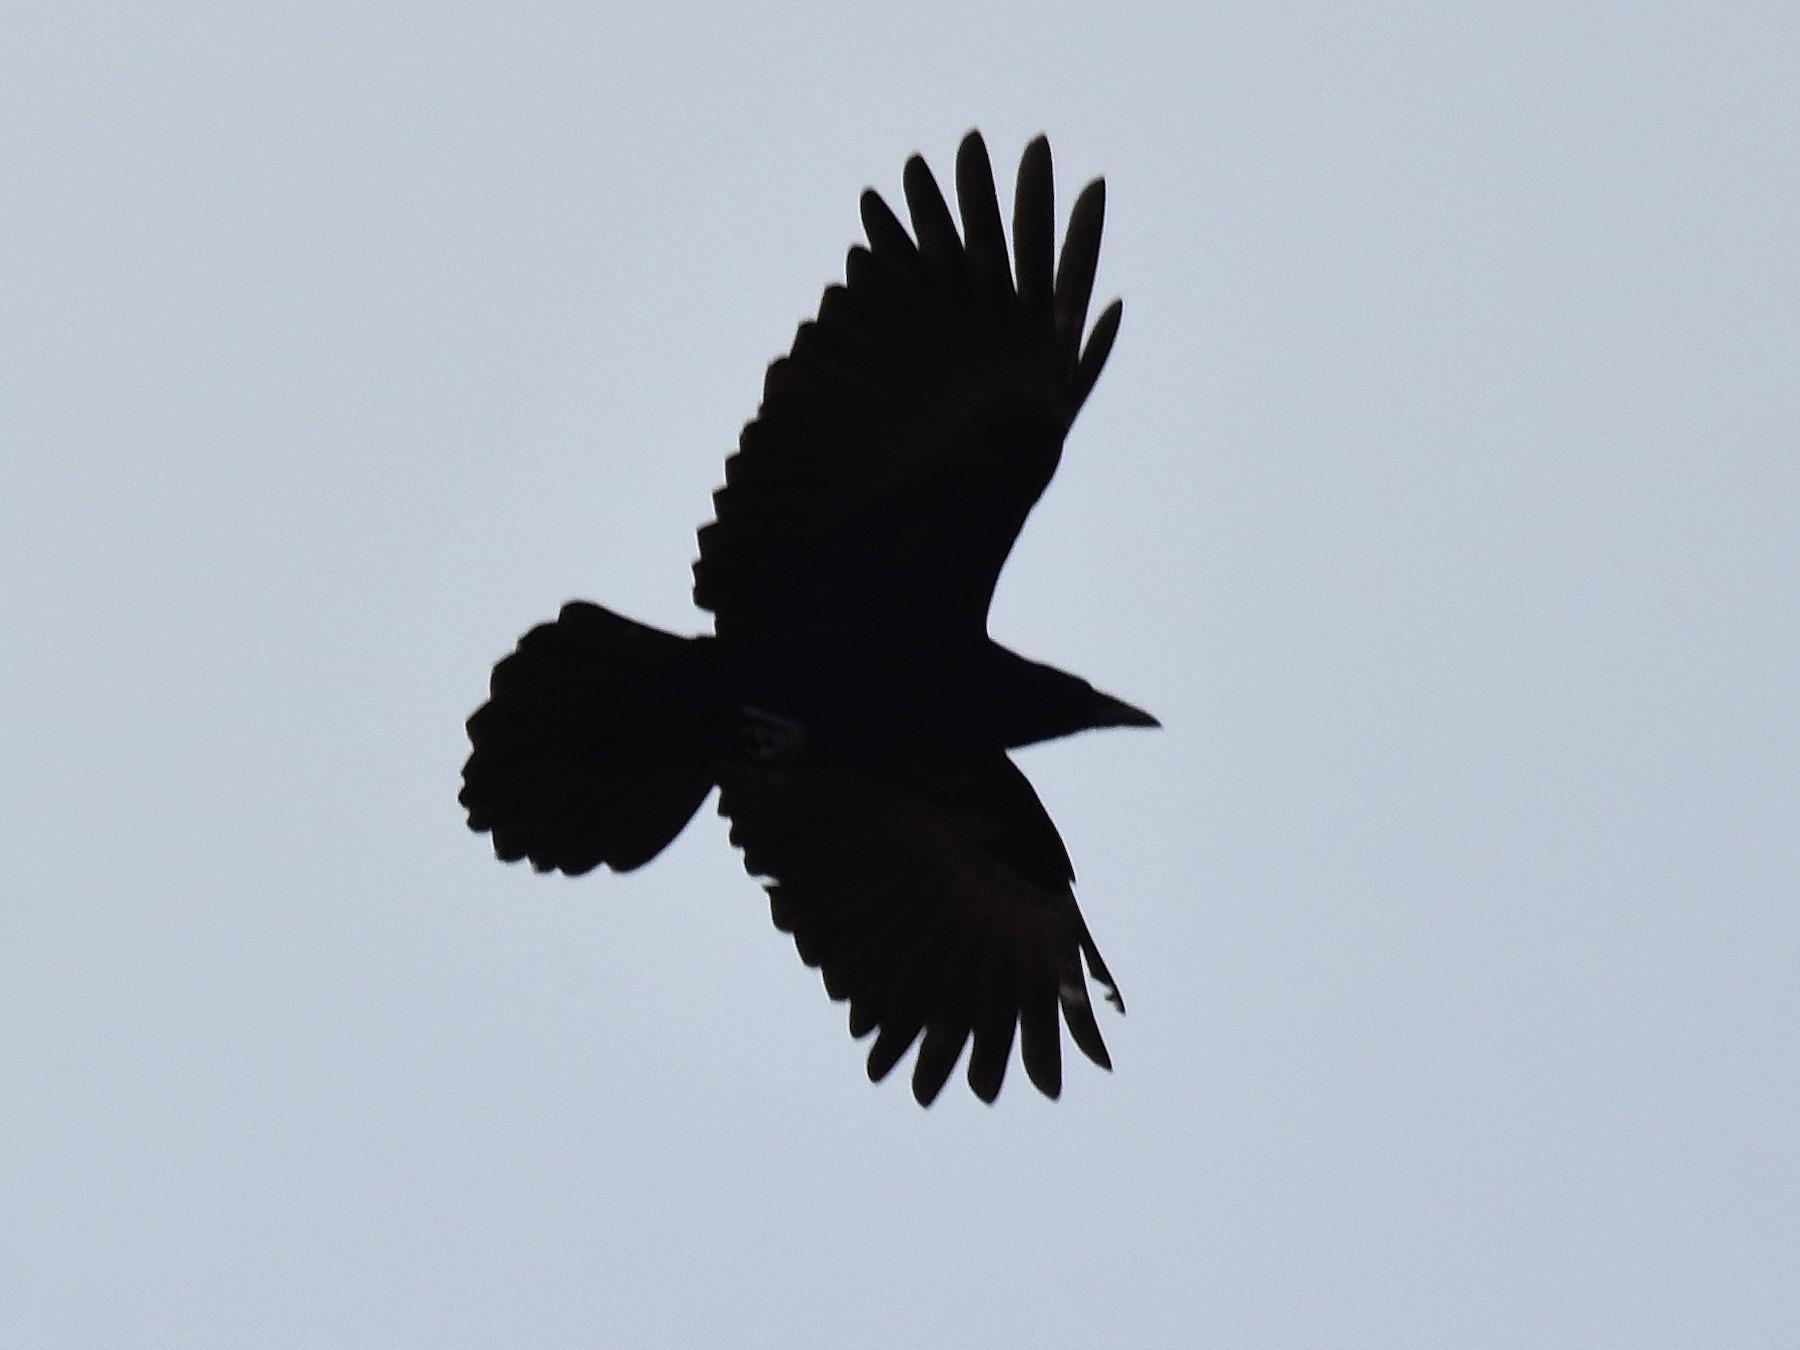 Carrion Crow - Lukasz Pulawski